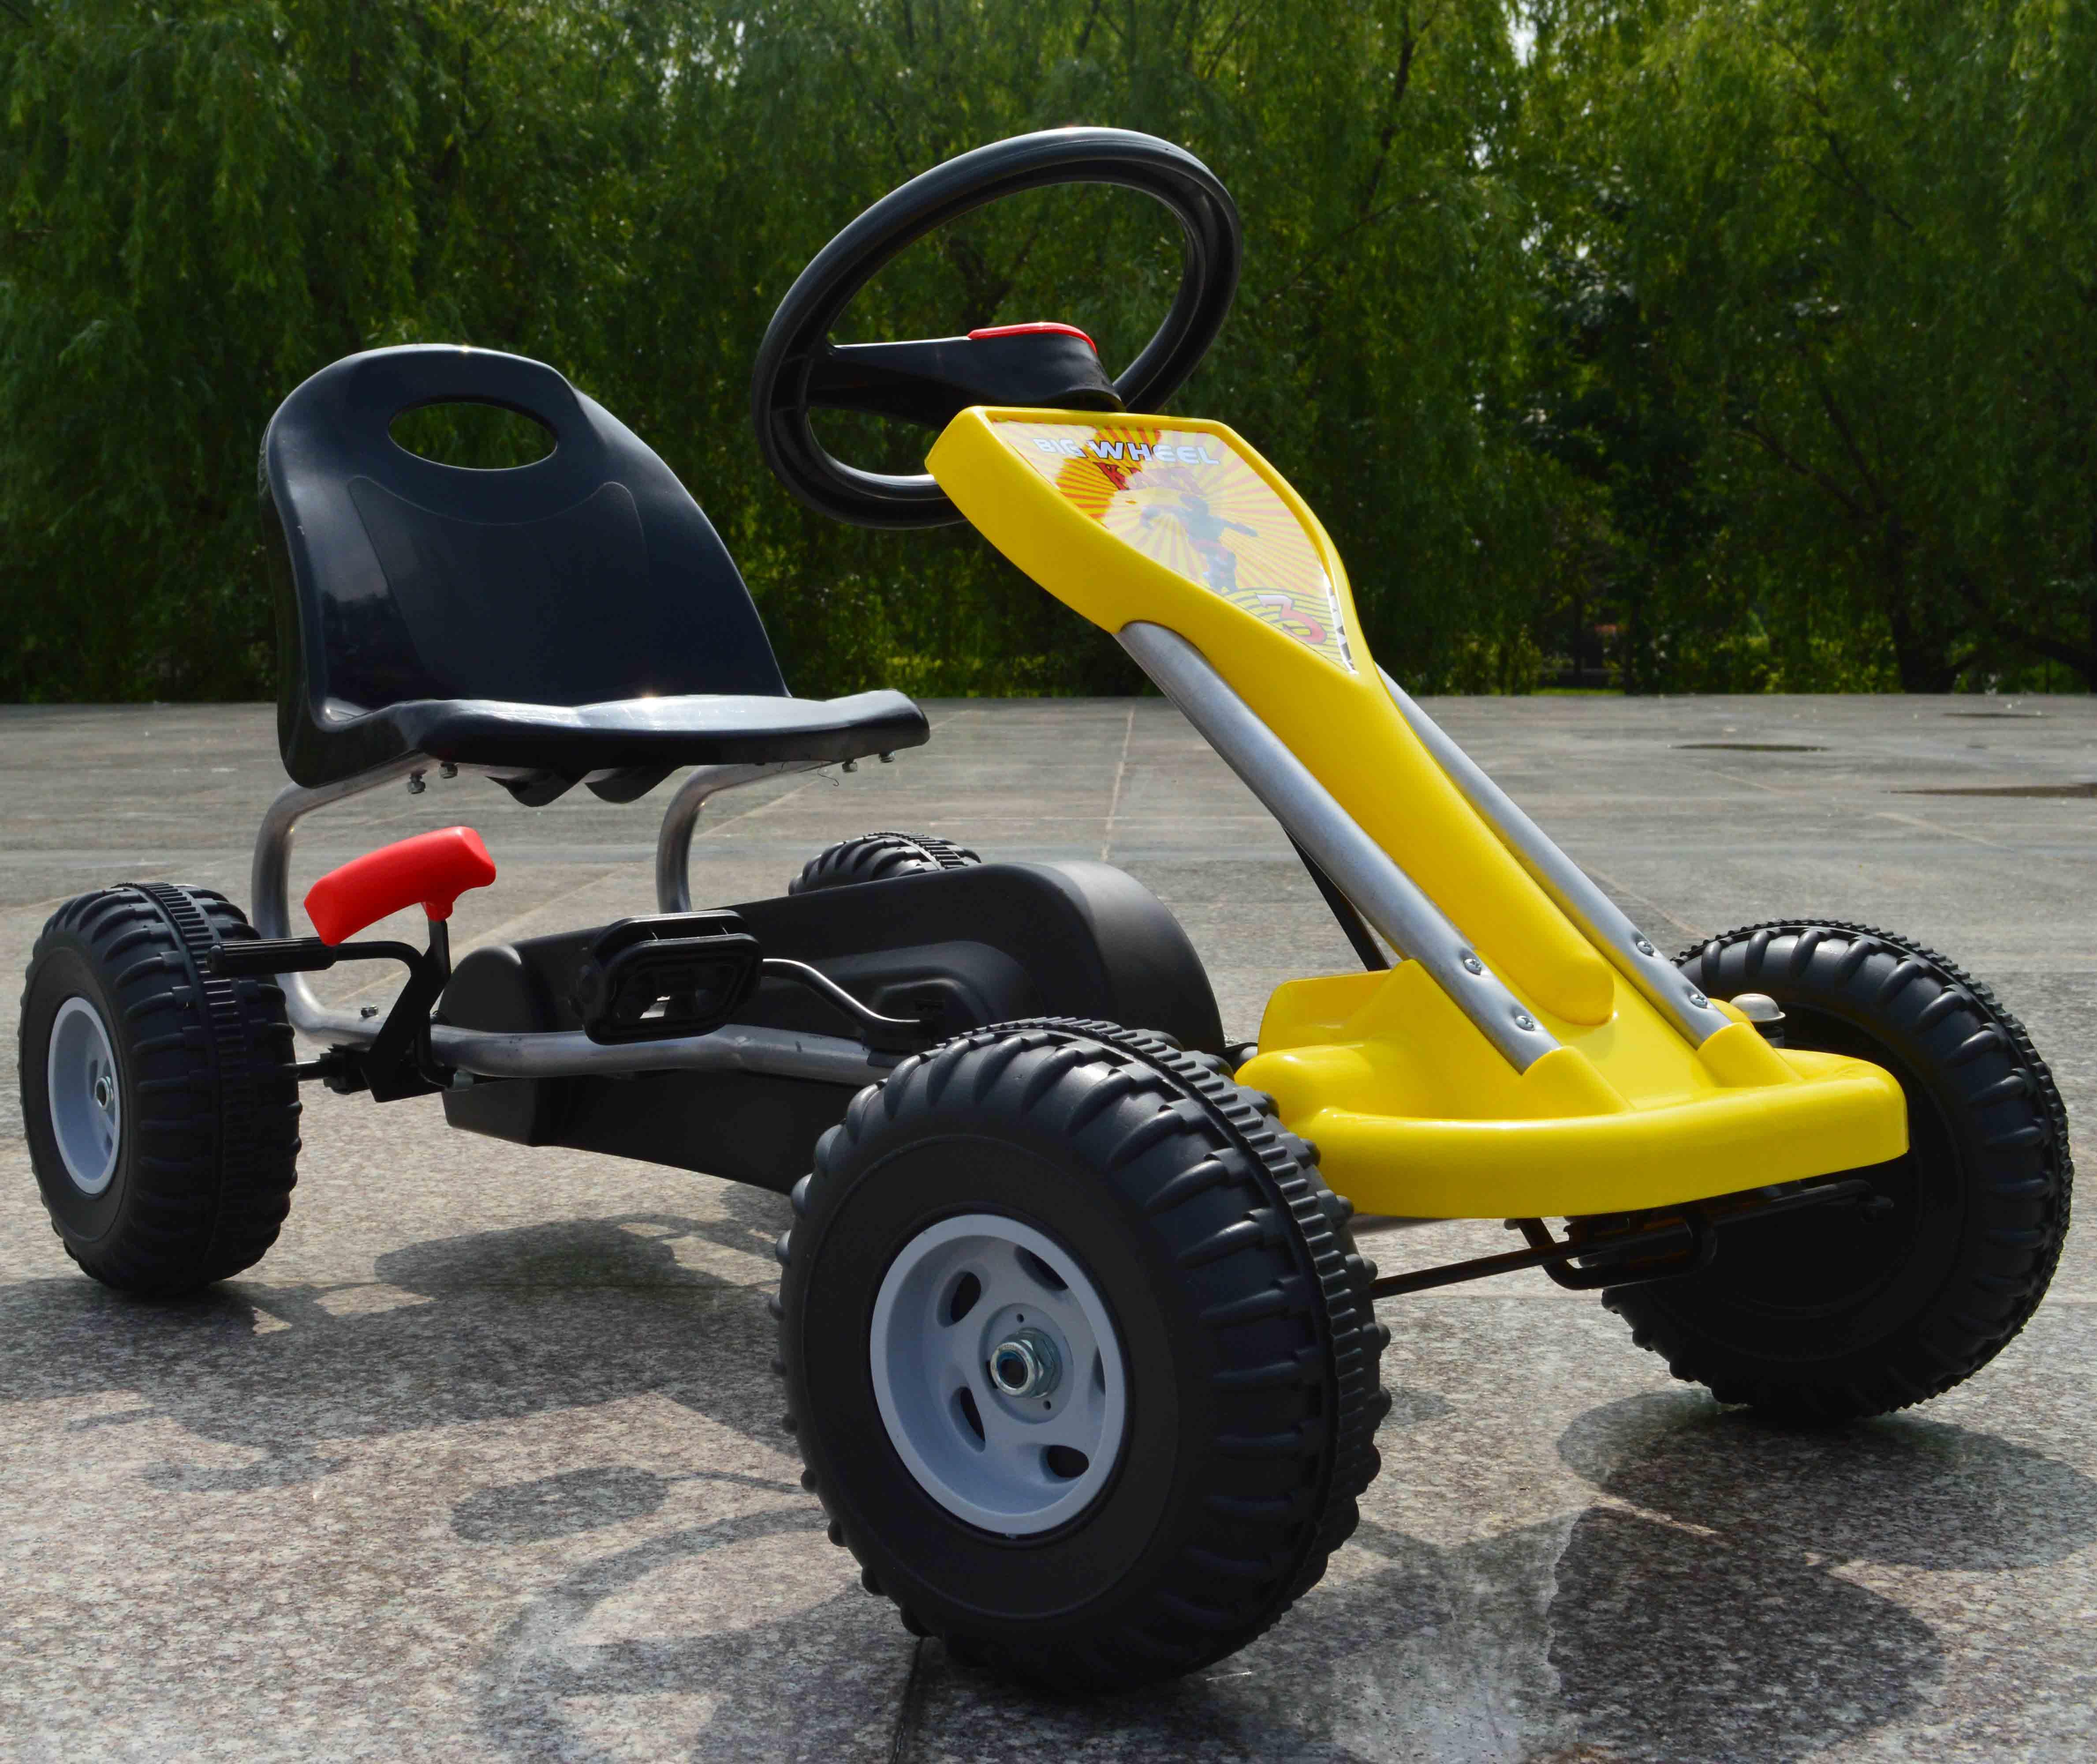 Racer coche del pedal/Go kart con Frenos de mano juventud Edades 3 + ...